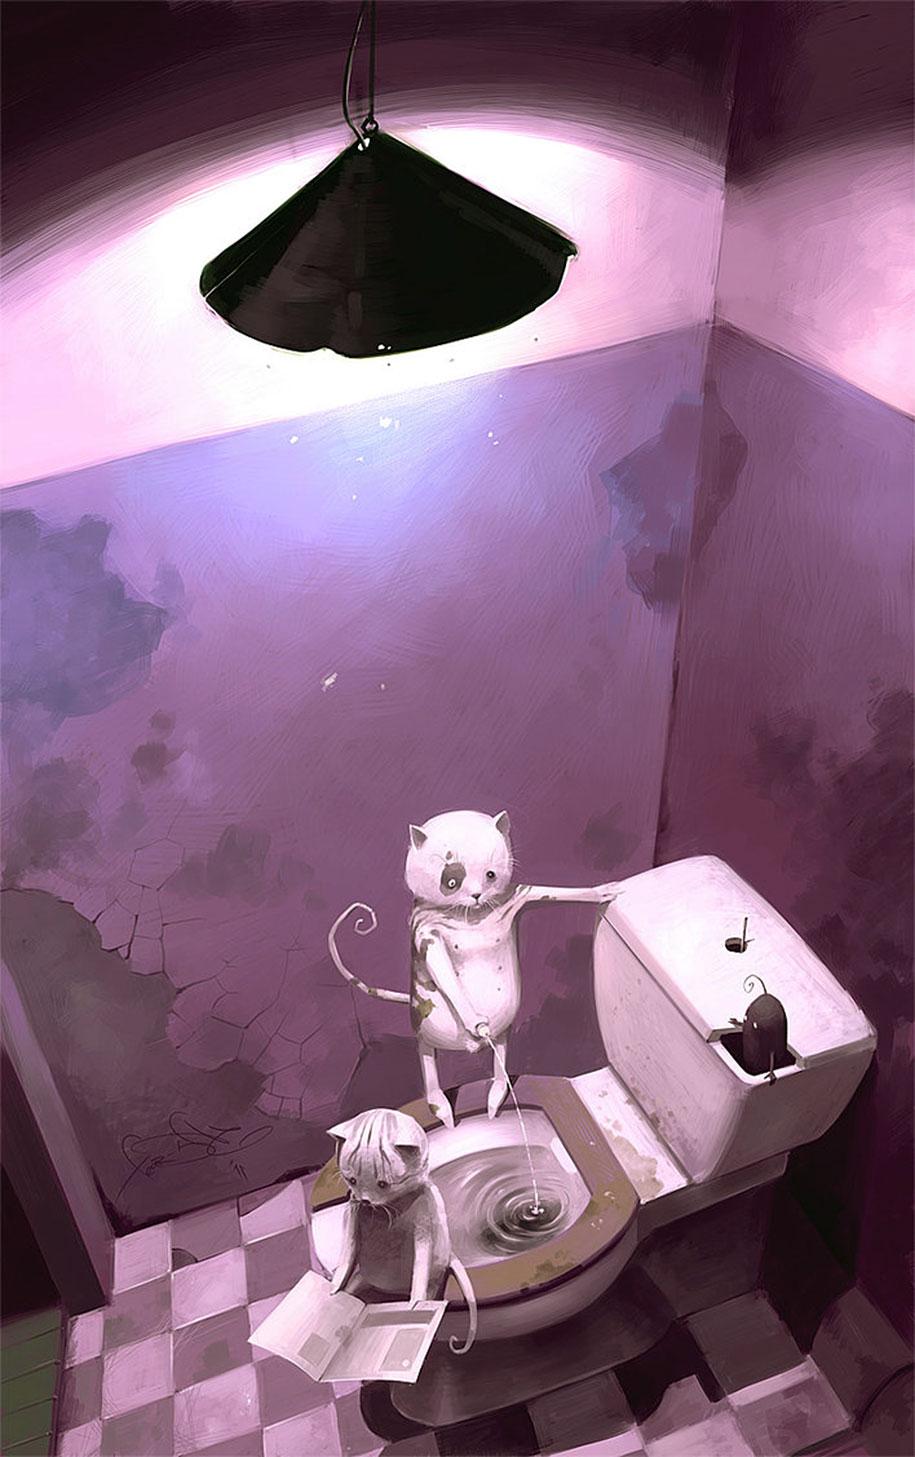 fantasy-with-touch-of-reality-russian-illustrator-sergey-svistunov-7